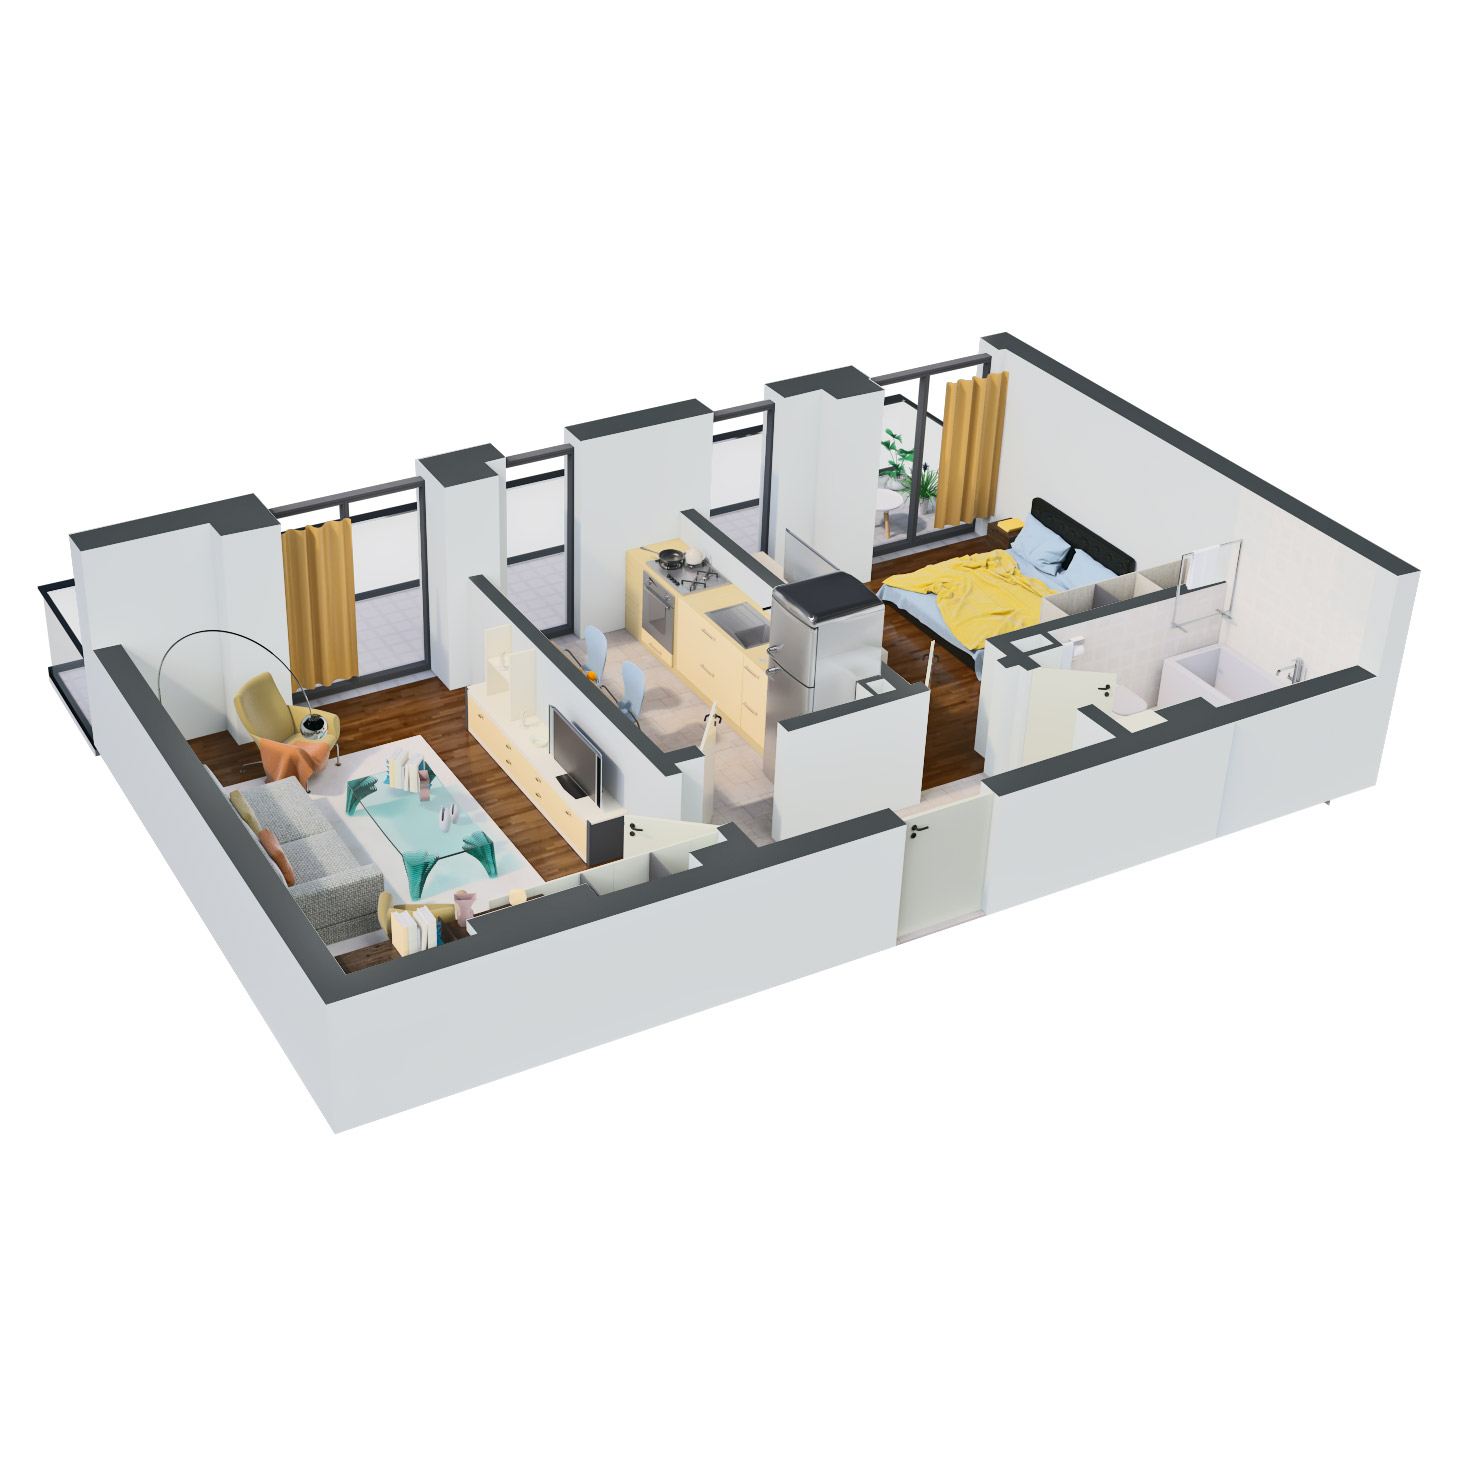 Apartament 2 camere de vanzare Bucuresti - Catedral Residence - Marriott, Piata Unirii, 13 Septembrie, Izvor - Tip 4 - T1 - D